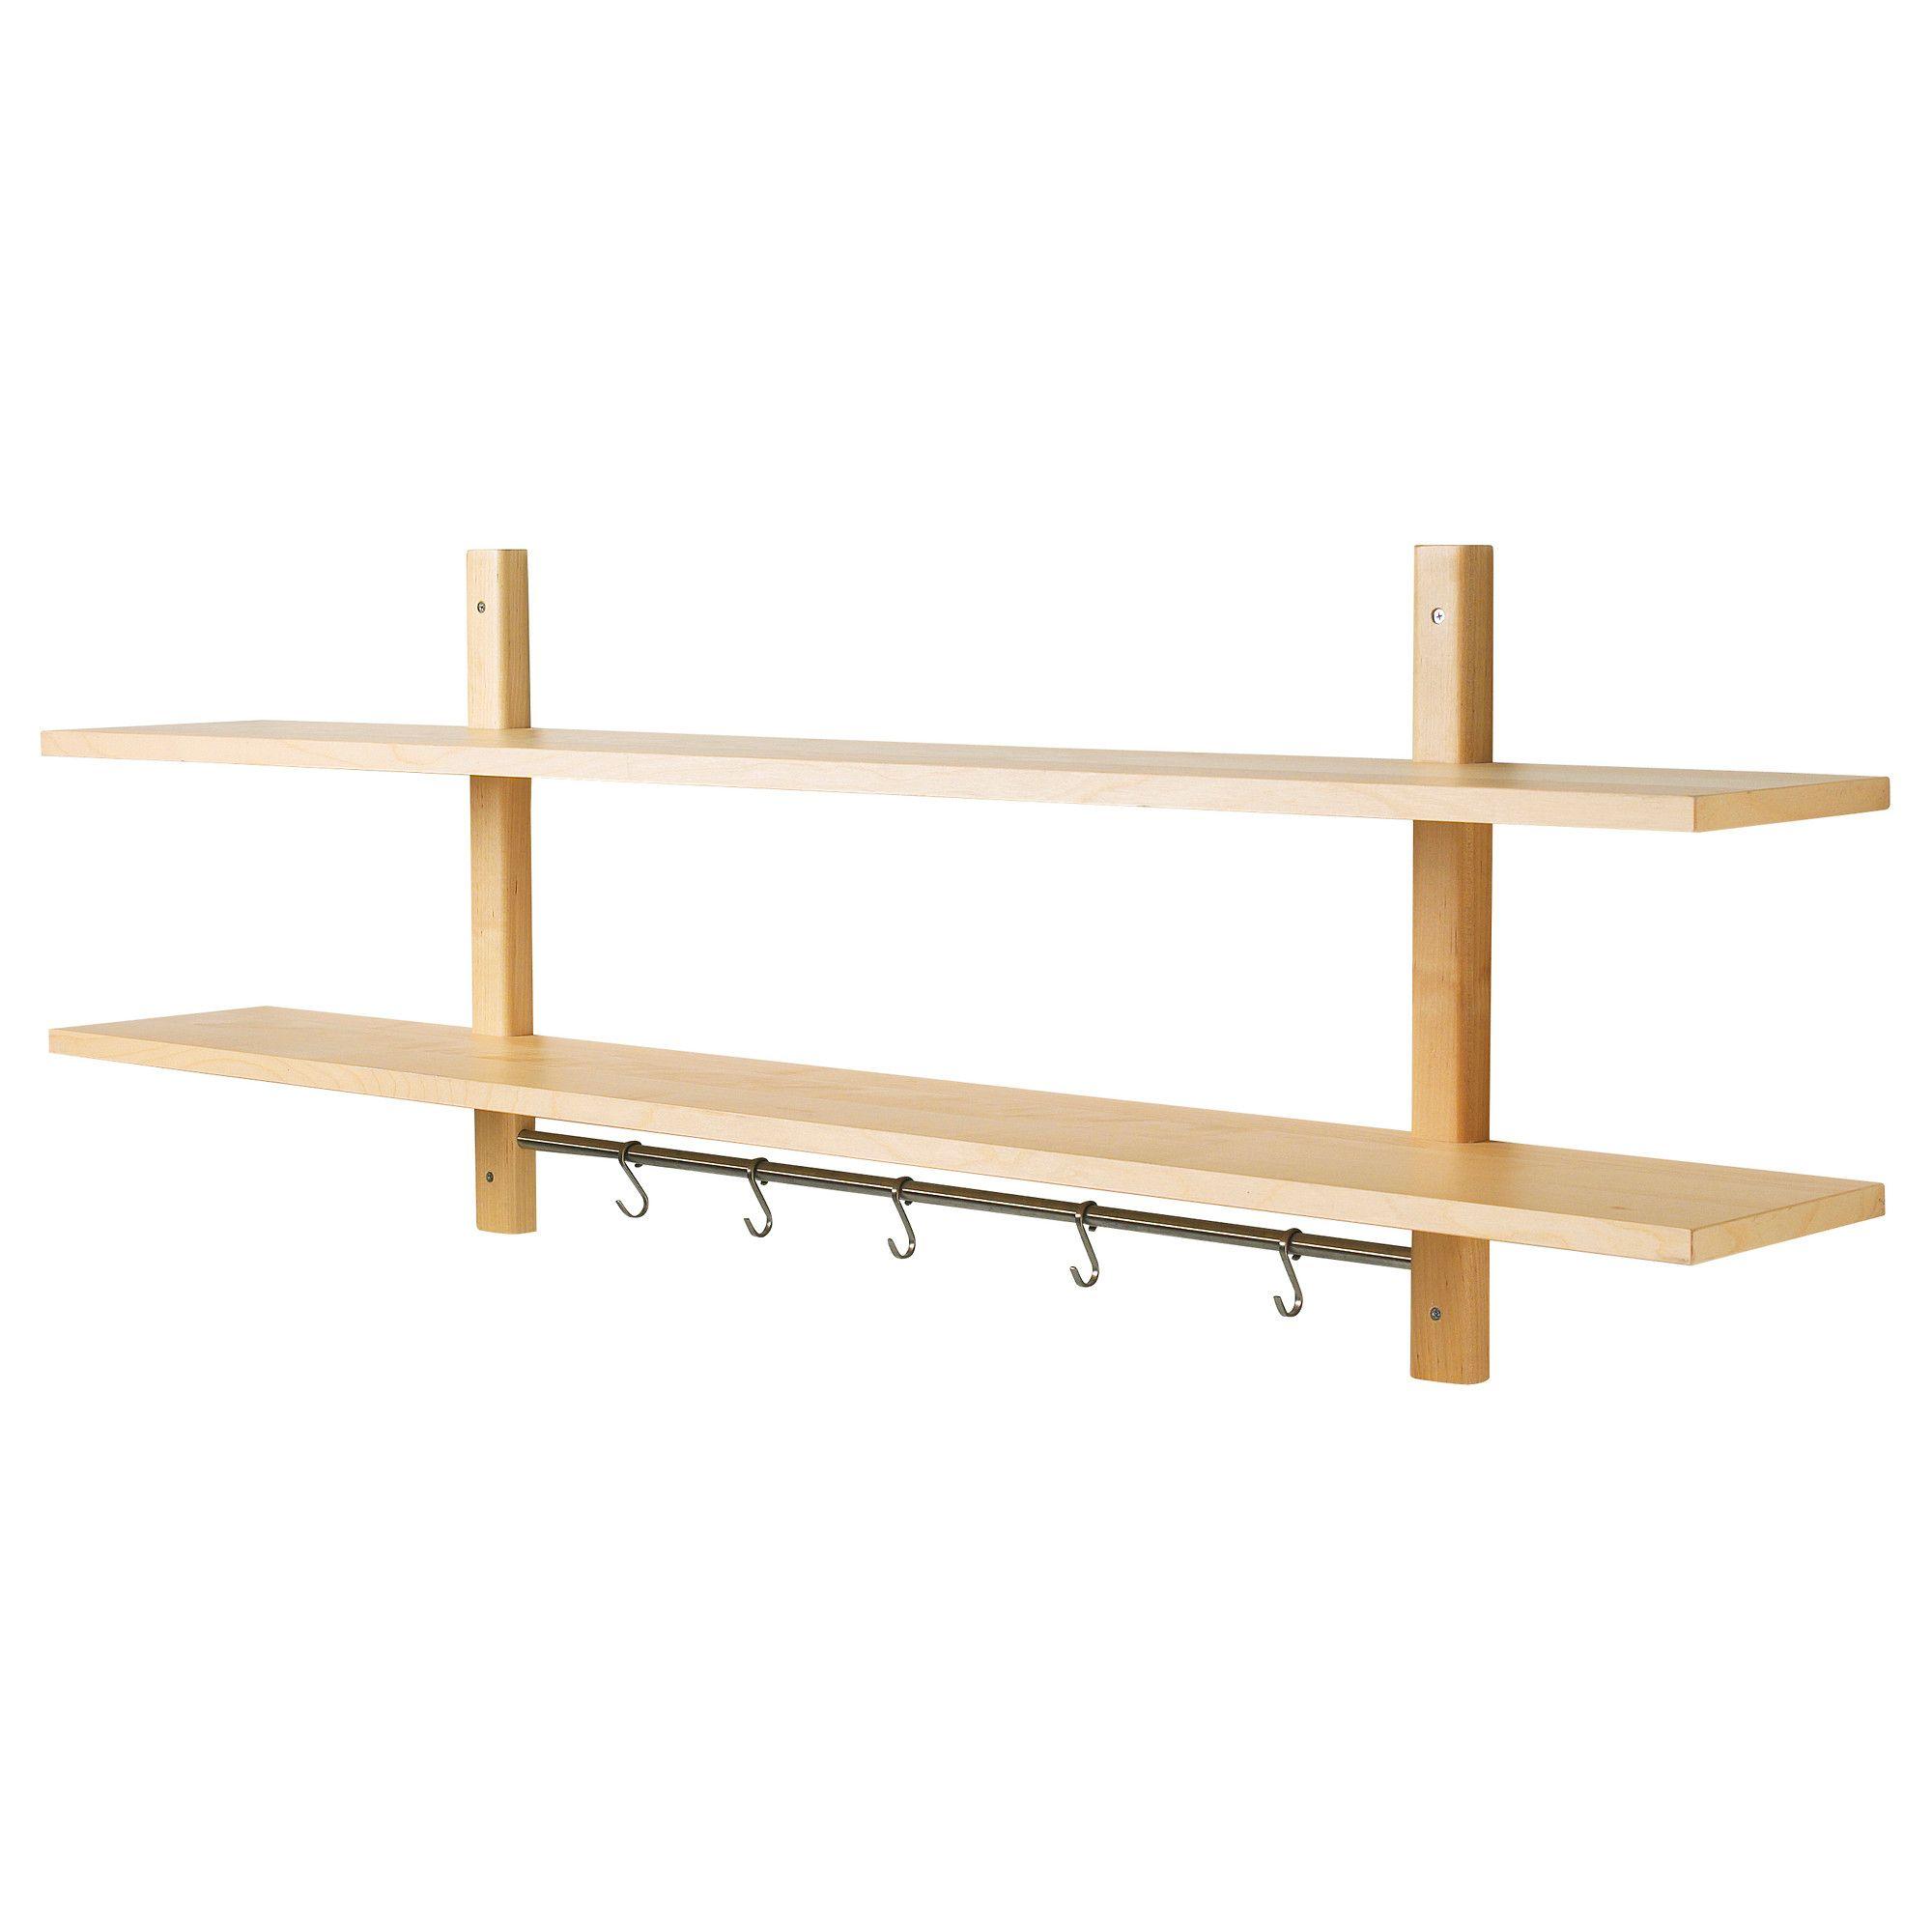 VÄRDE Wall shelf with 5 hooks Birch 140 x 50 cm | Pinterest | Värde ...